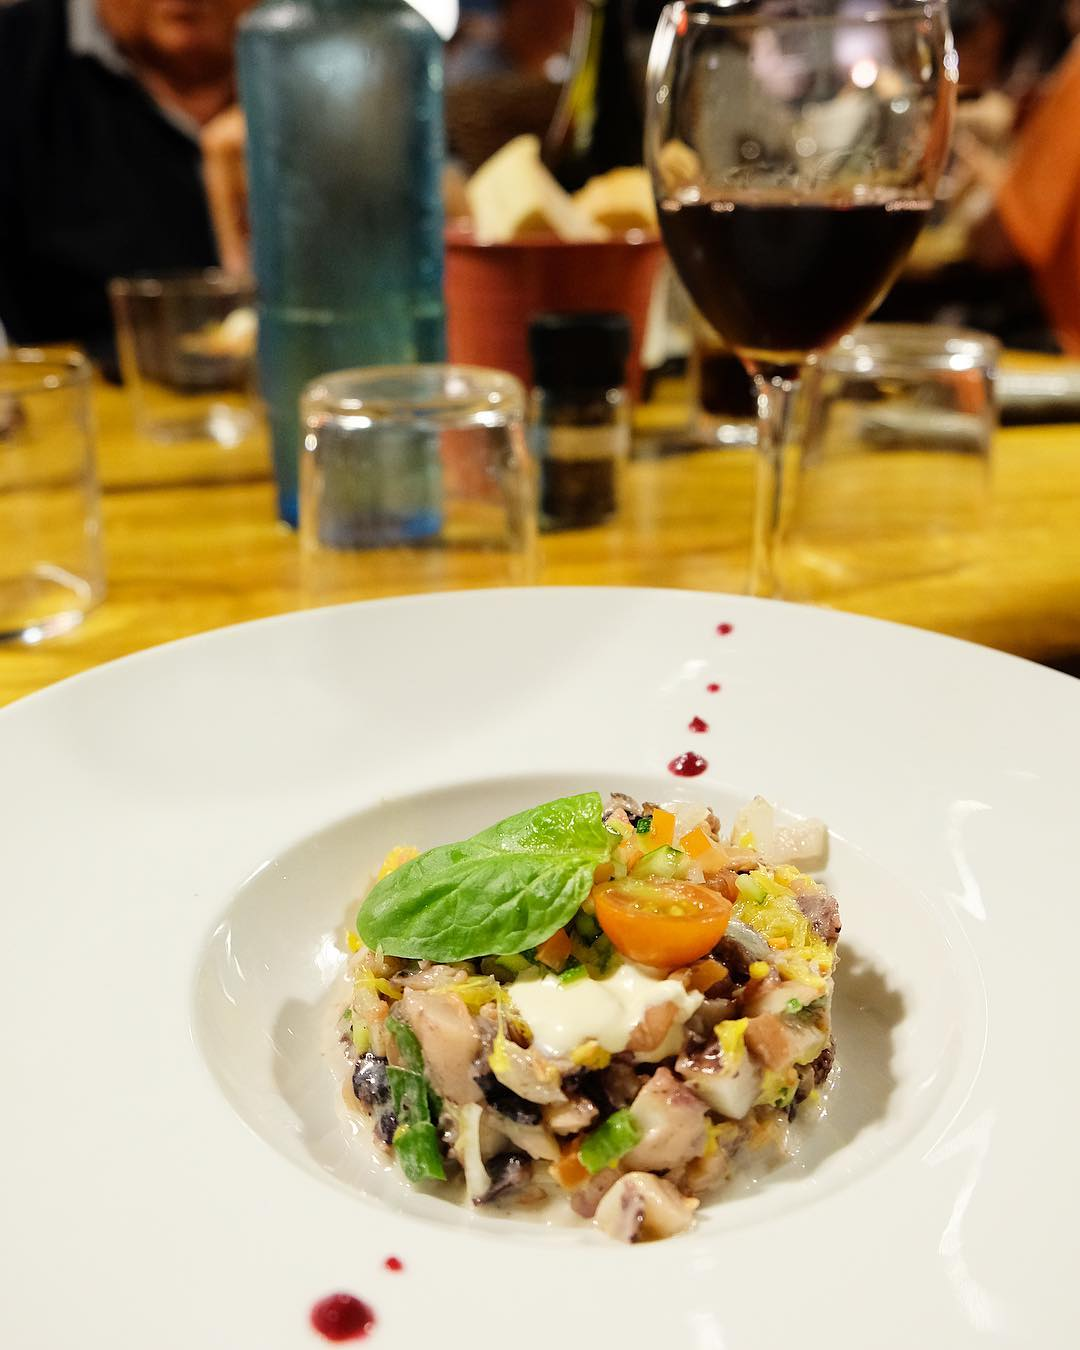 〰 P O U L P E ? 〰 . . ➕ LE J • restaurant de Plage à l'année . ? Carnon (34)?? ??? Bientôt Article sur le blog  _______________ #lejcarnon #restaurant #food #foodlover #blogfood #foodporn #foodstagram #gastronomy #cooking #foodphotography #montpellier #carnon #pintademontpellier #seiche #beachlife